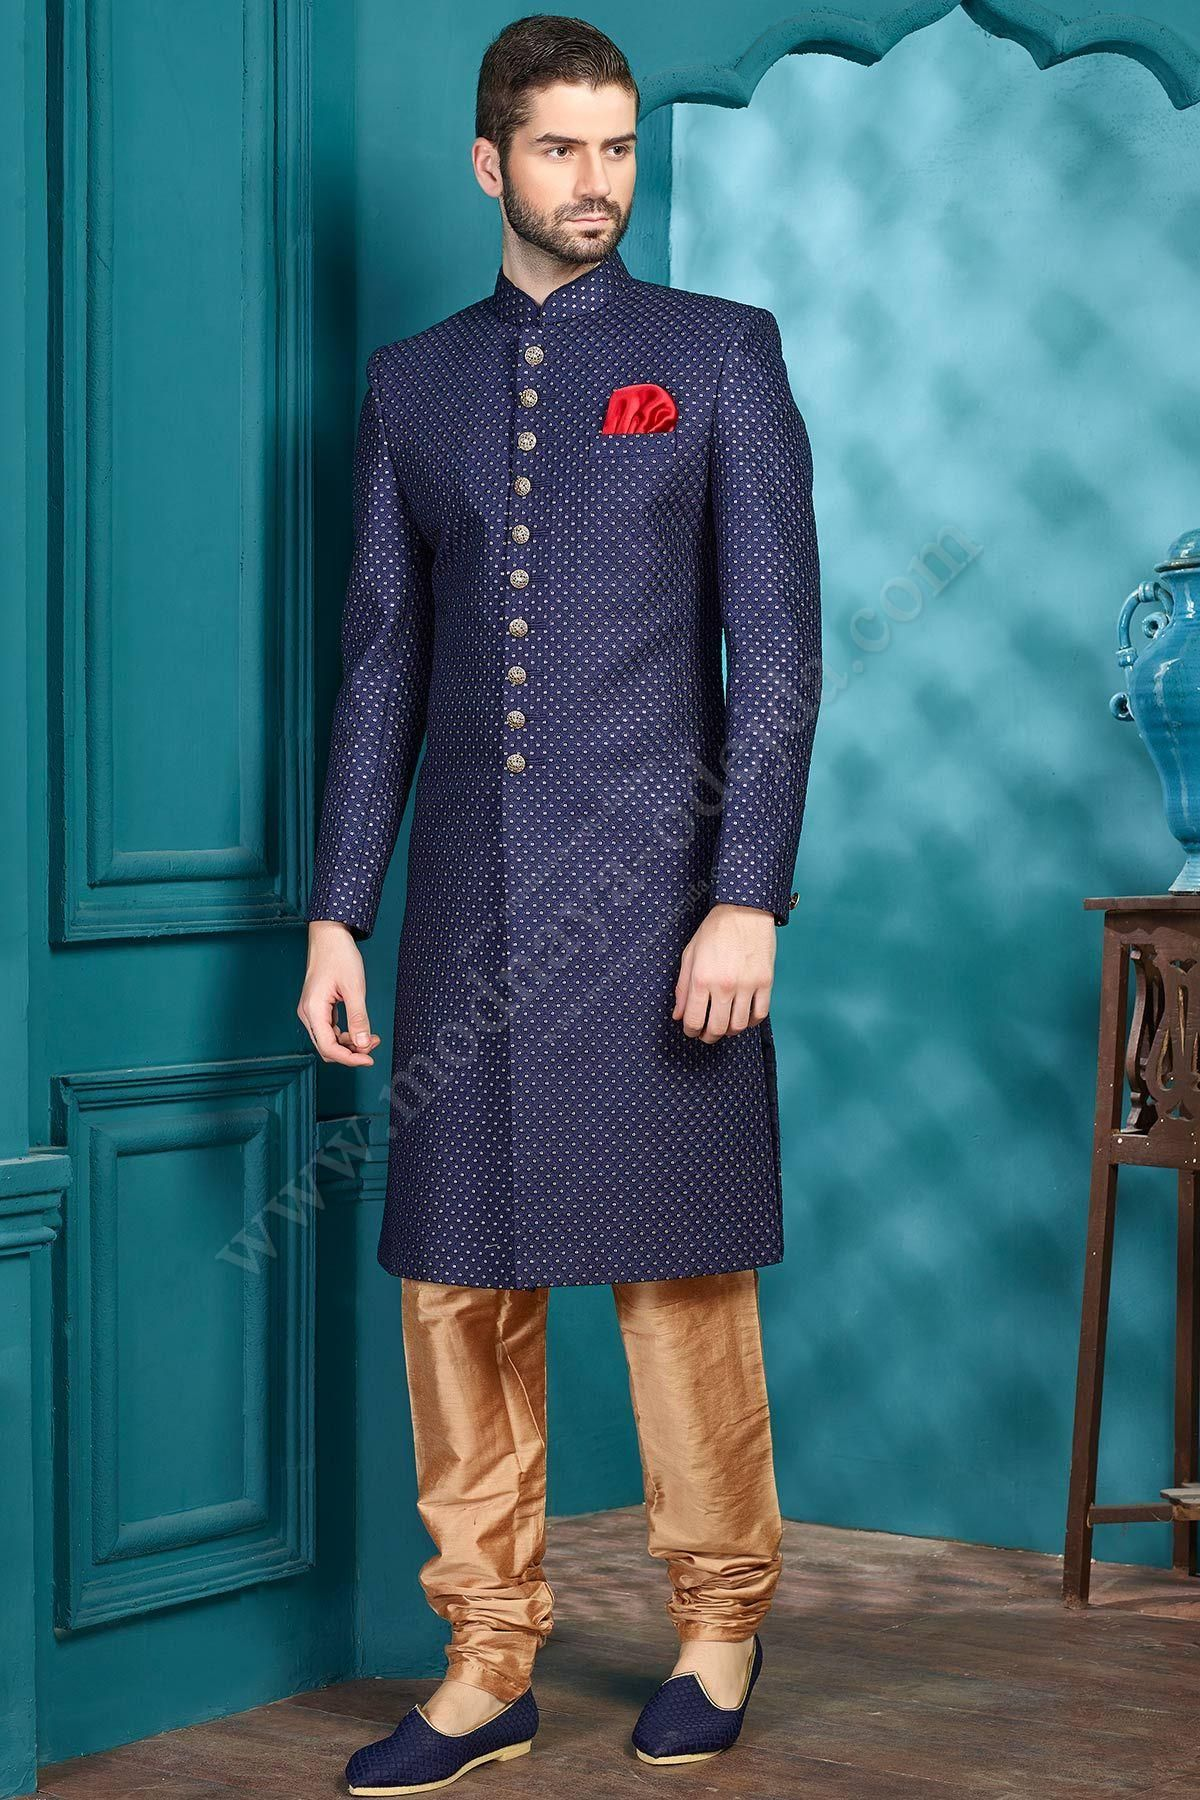 National Indian Mens Wedding Suit Wedding Suits Men Suits Men Business Sherwani [ 1800 x 1200 Pixel ]